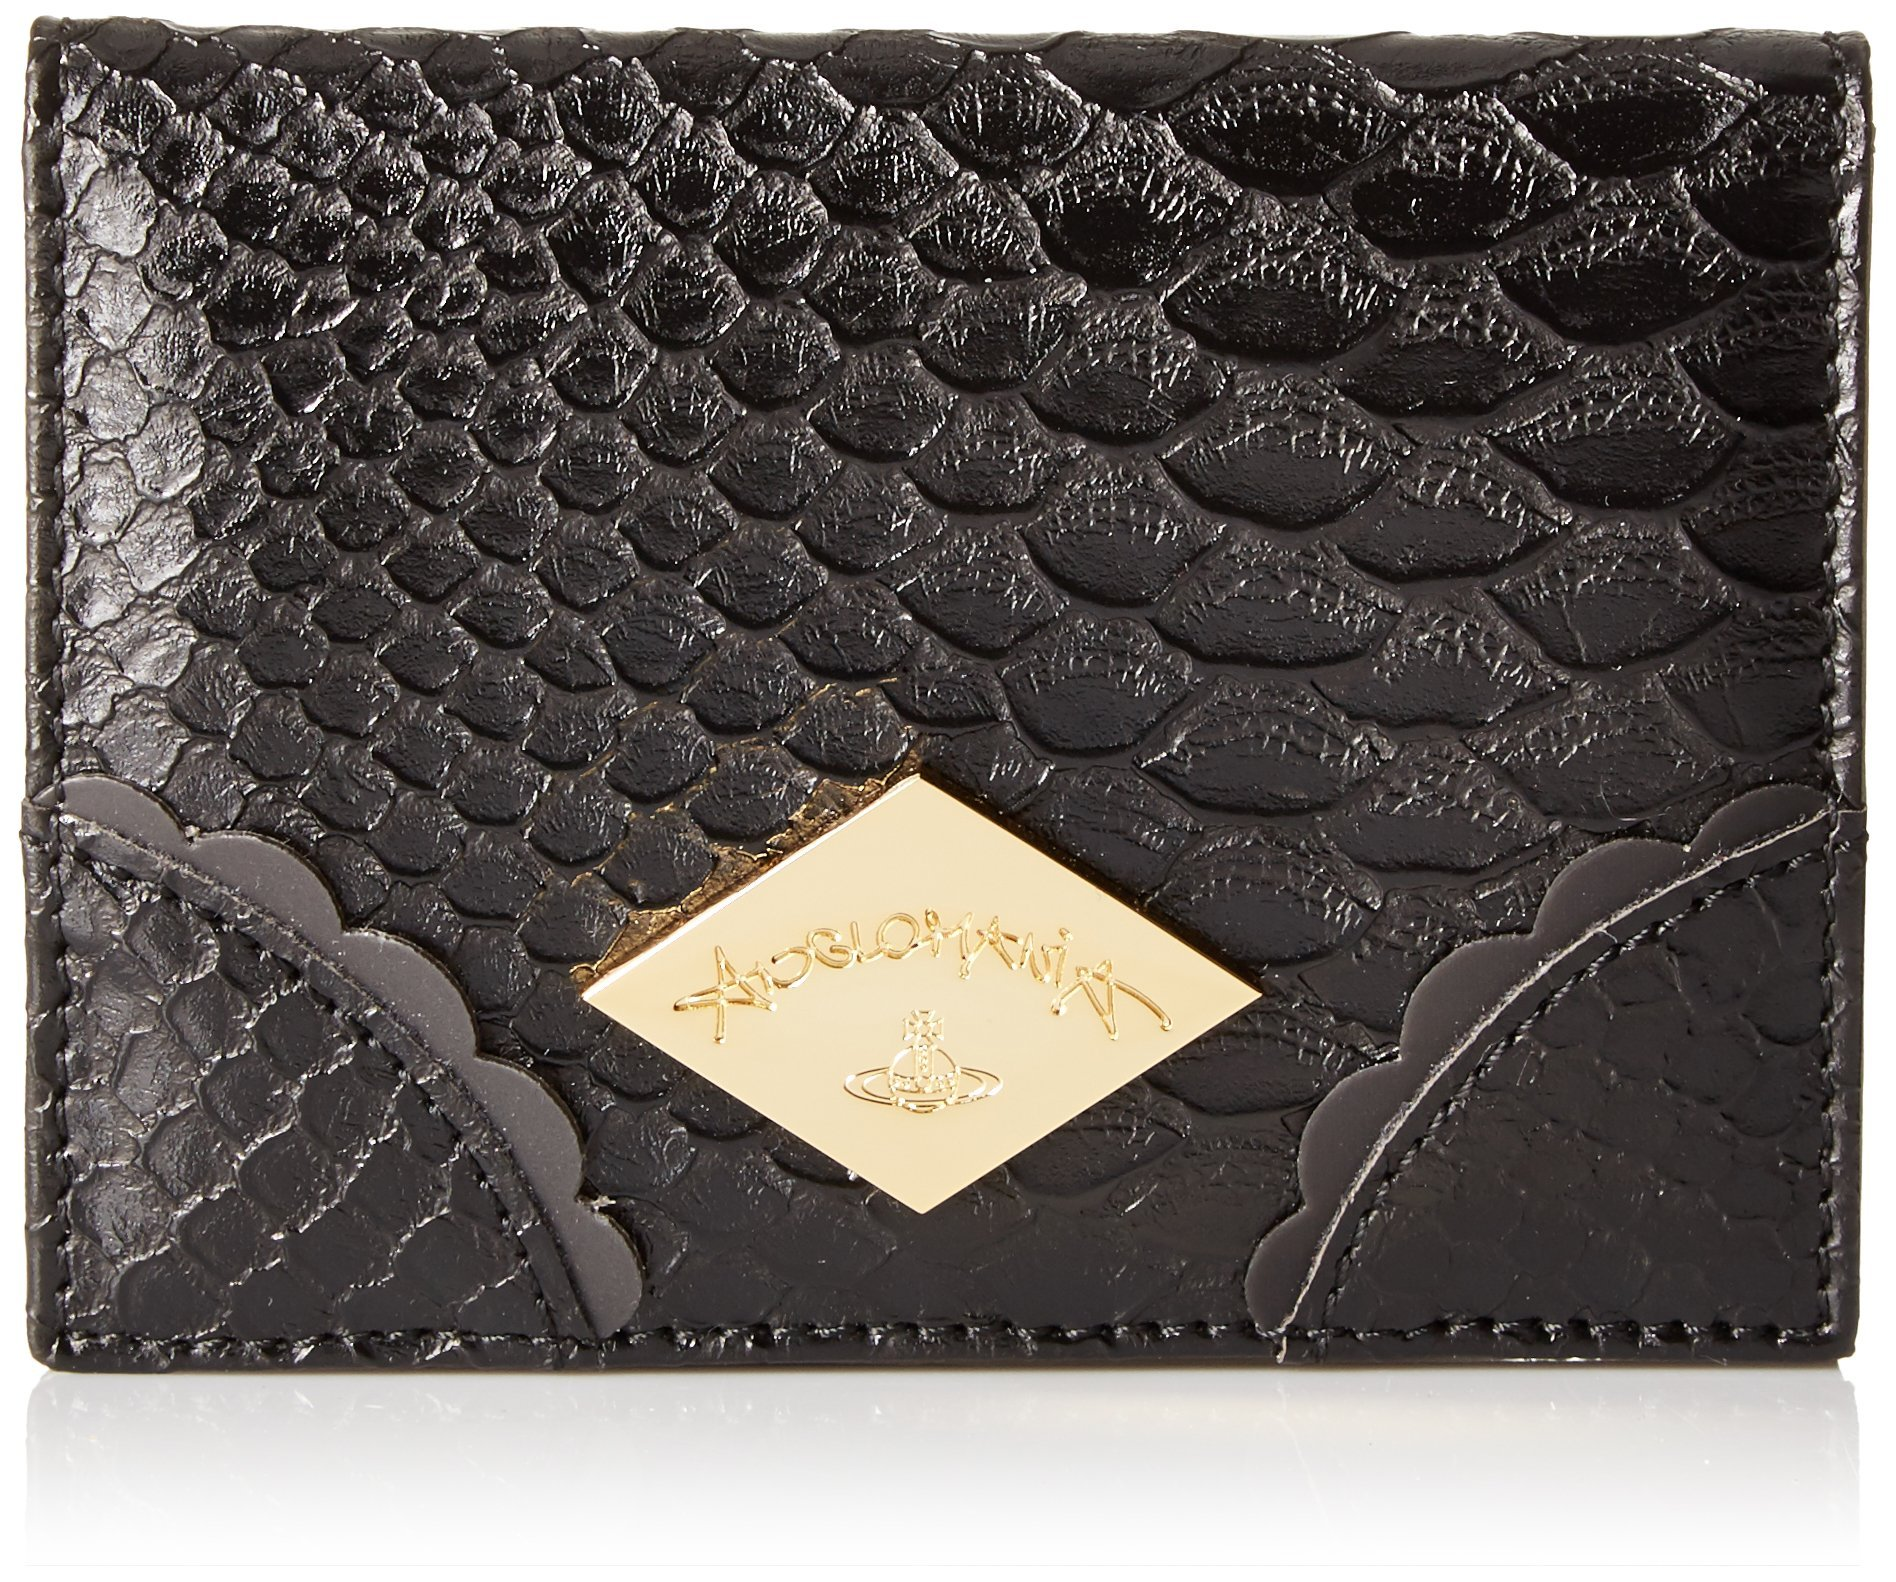 Vivienne Westwood Frilly Snake Credit Card Holder, Black, One Size by Vivienne Westwood